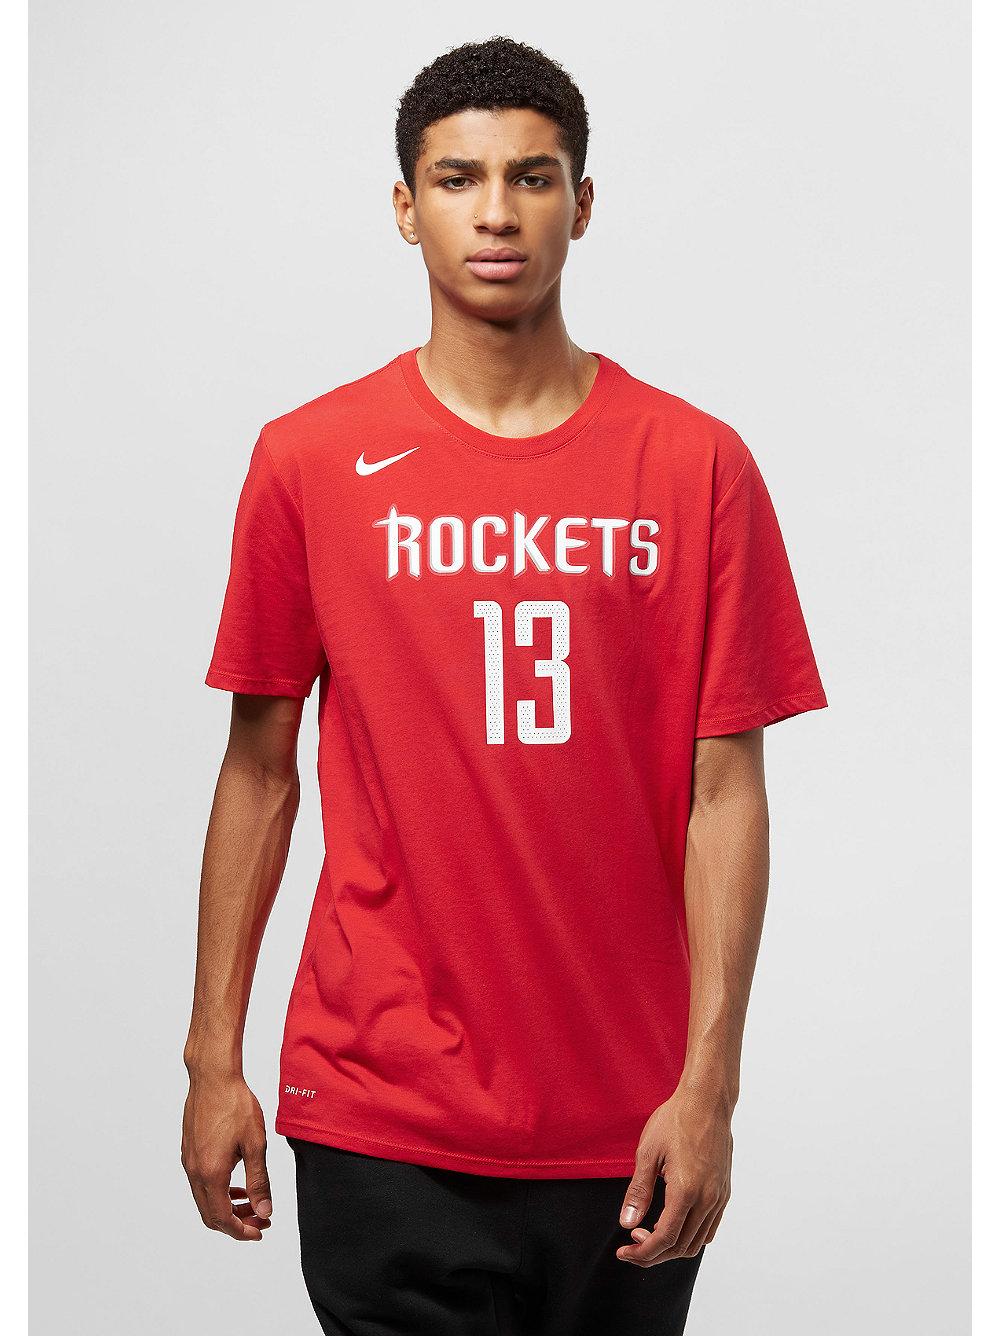 NIKE T-Shirt NBA Houston Rockets Harden